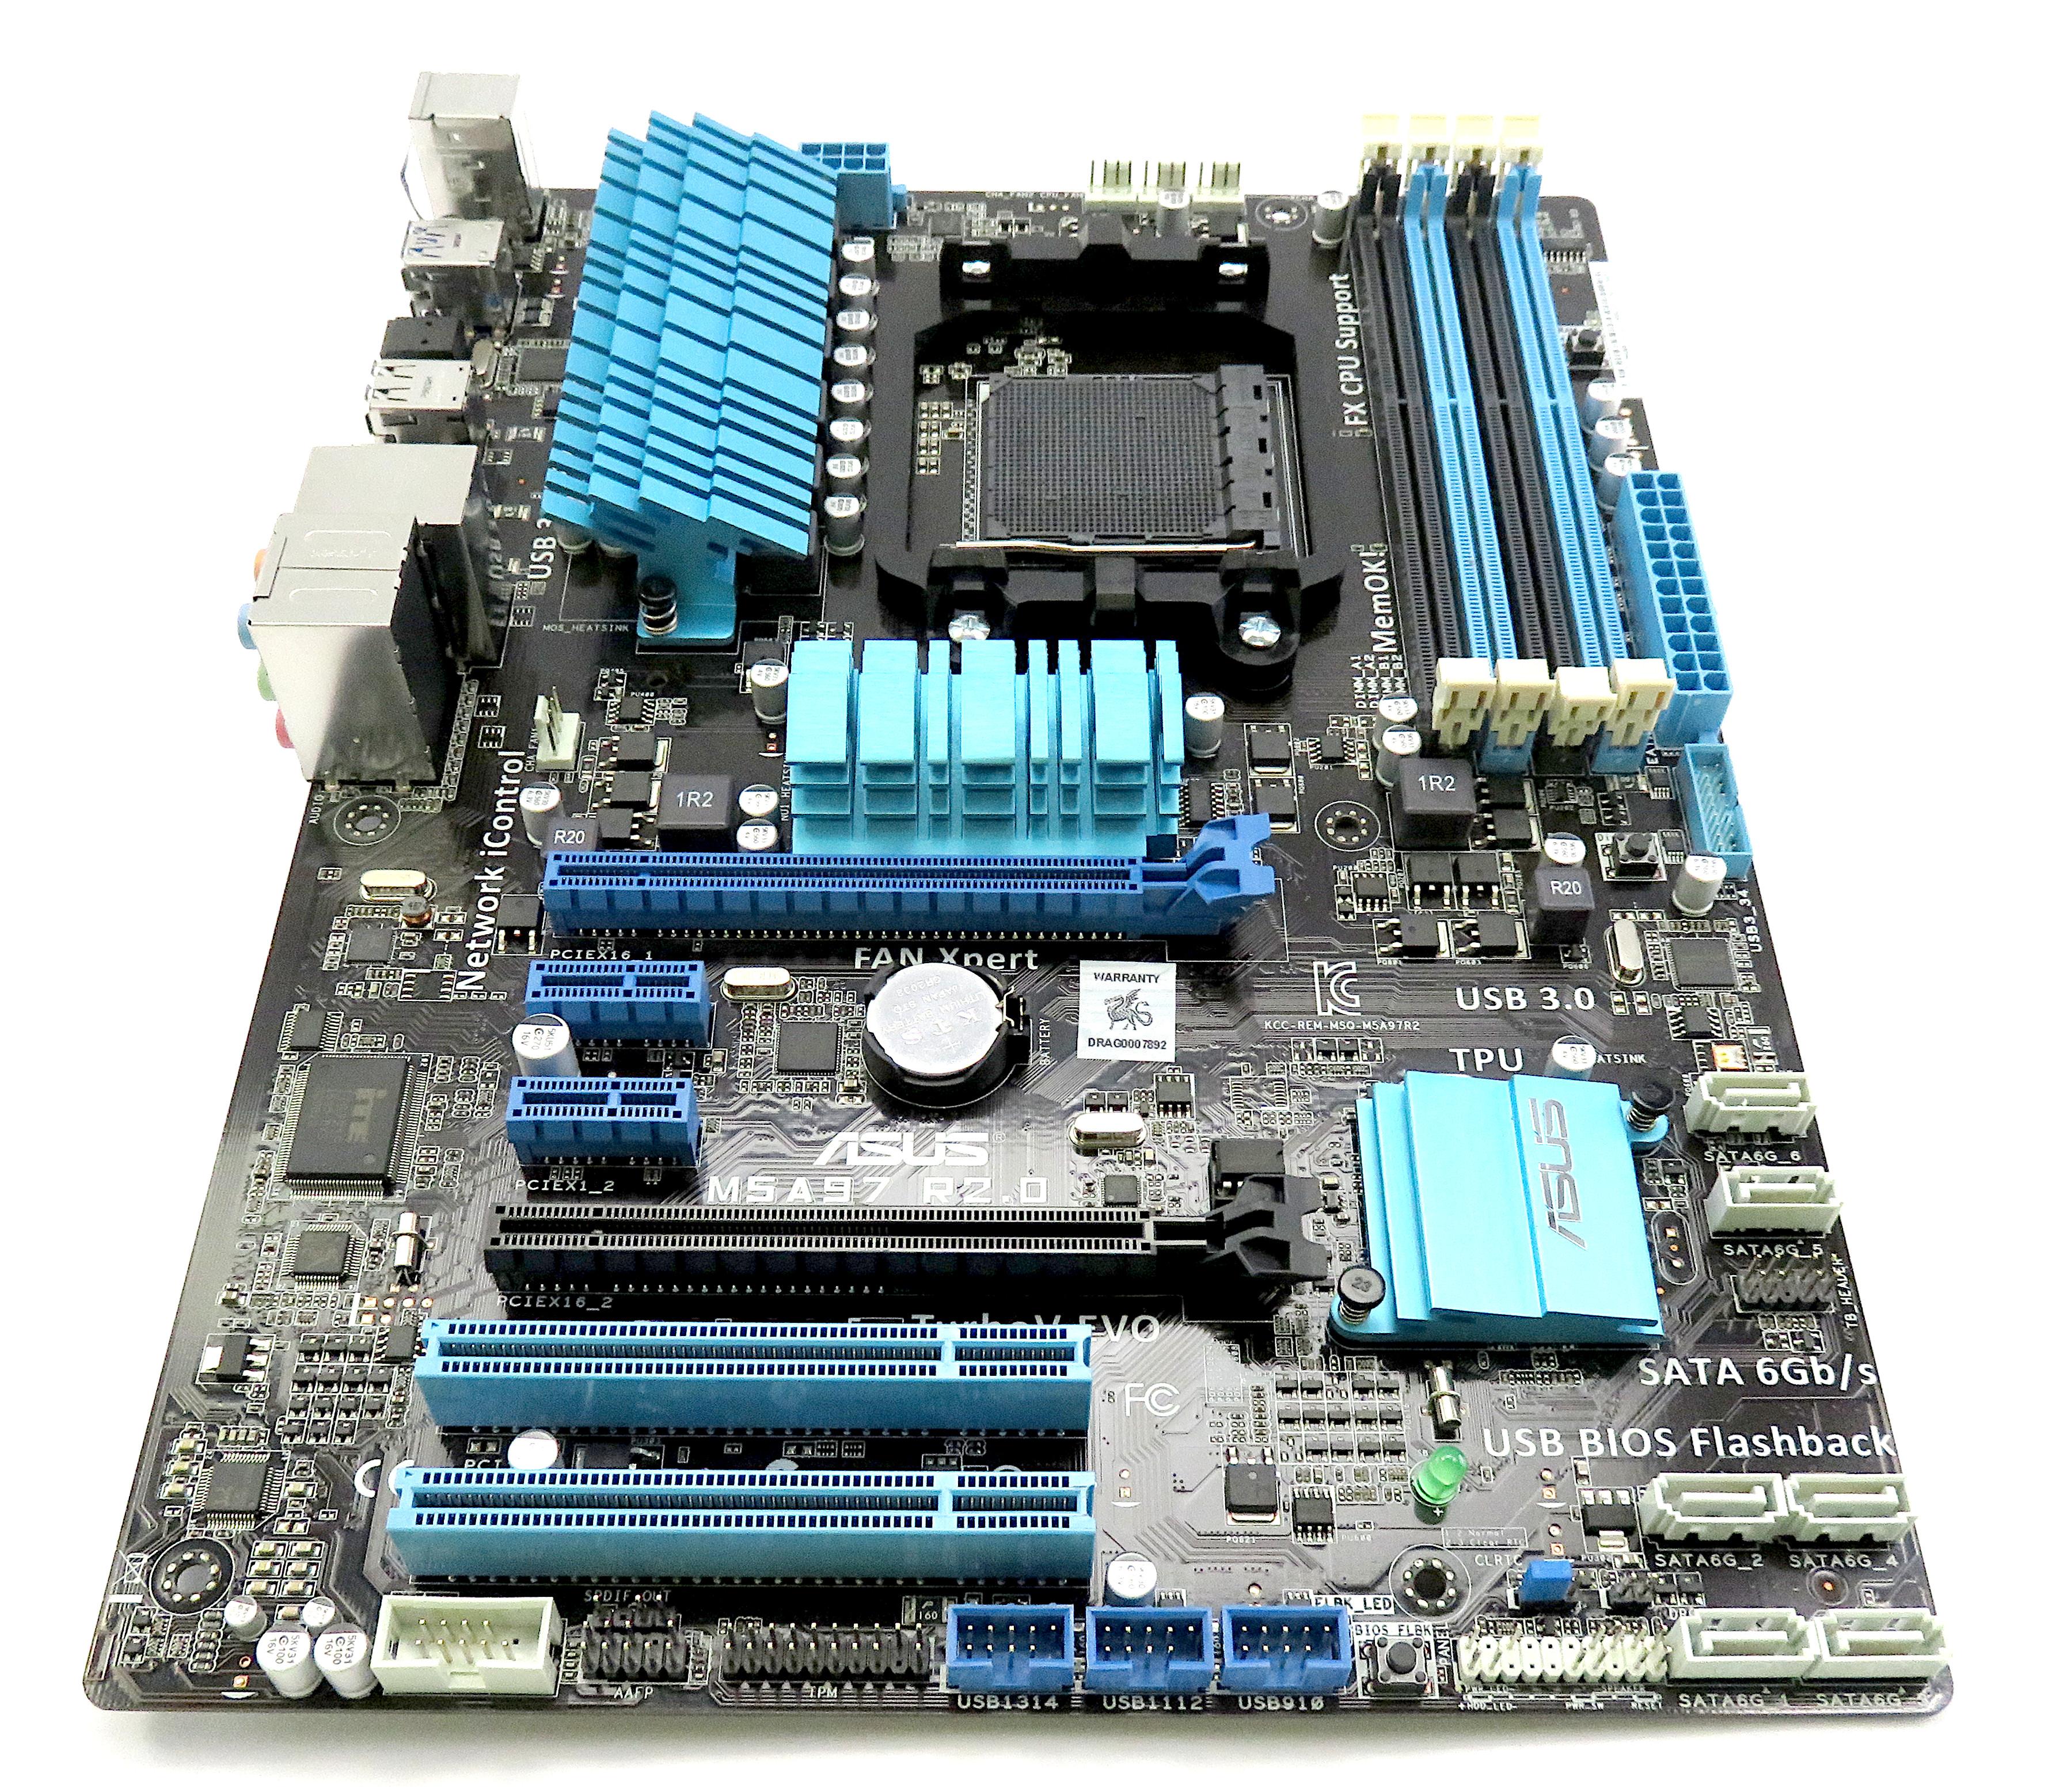 Asus M5A97 R2.0 TurboV Evo AMD Socket AM3+ FX Support Motherboard